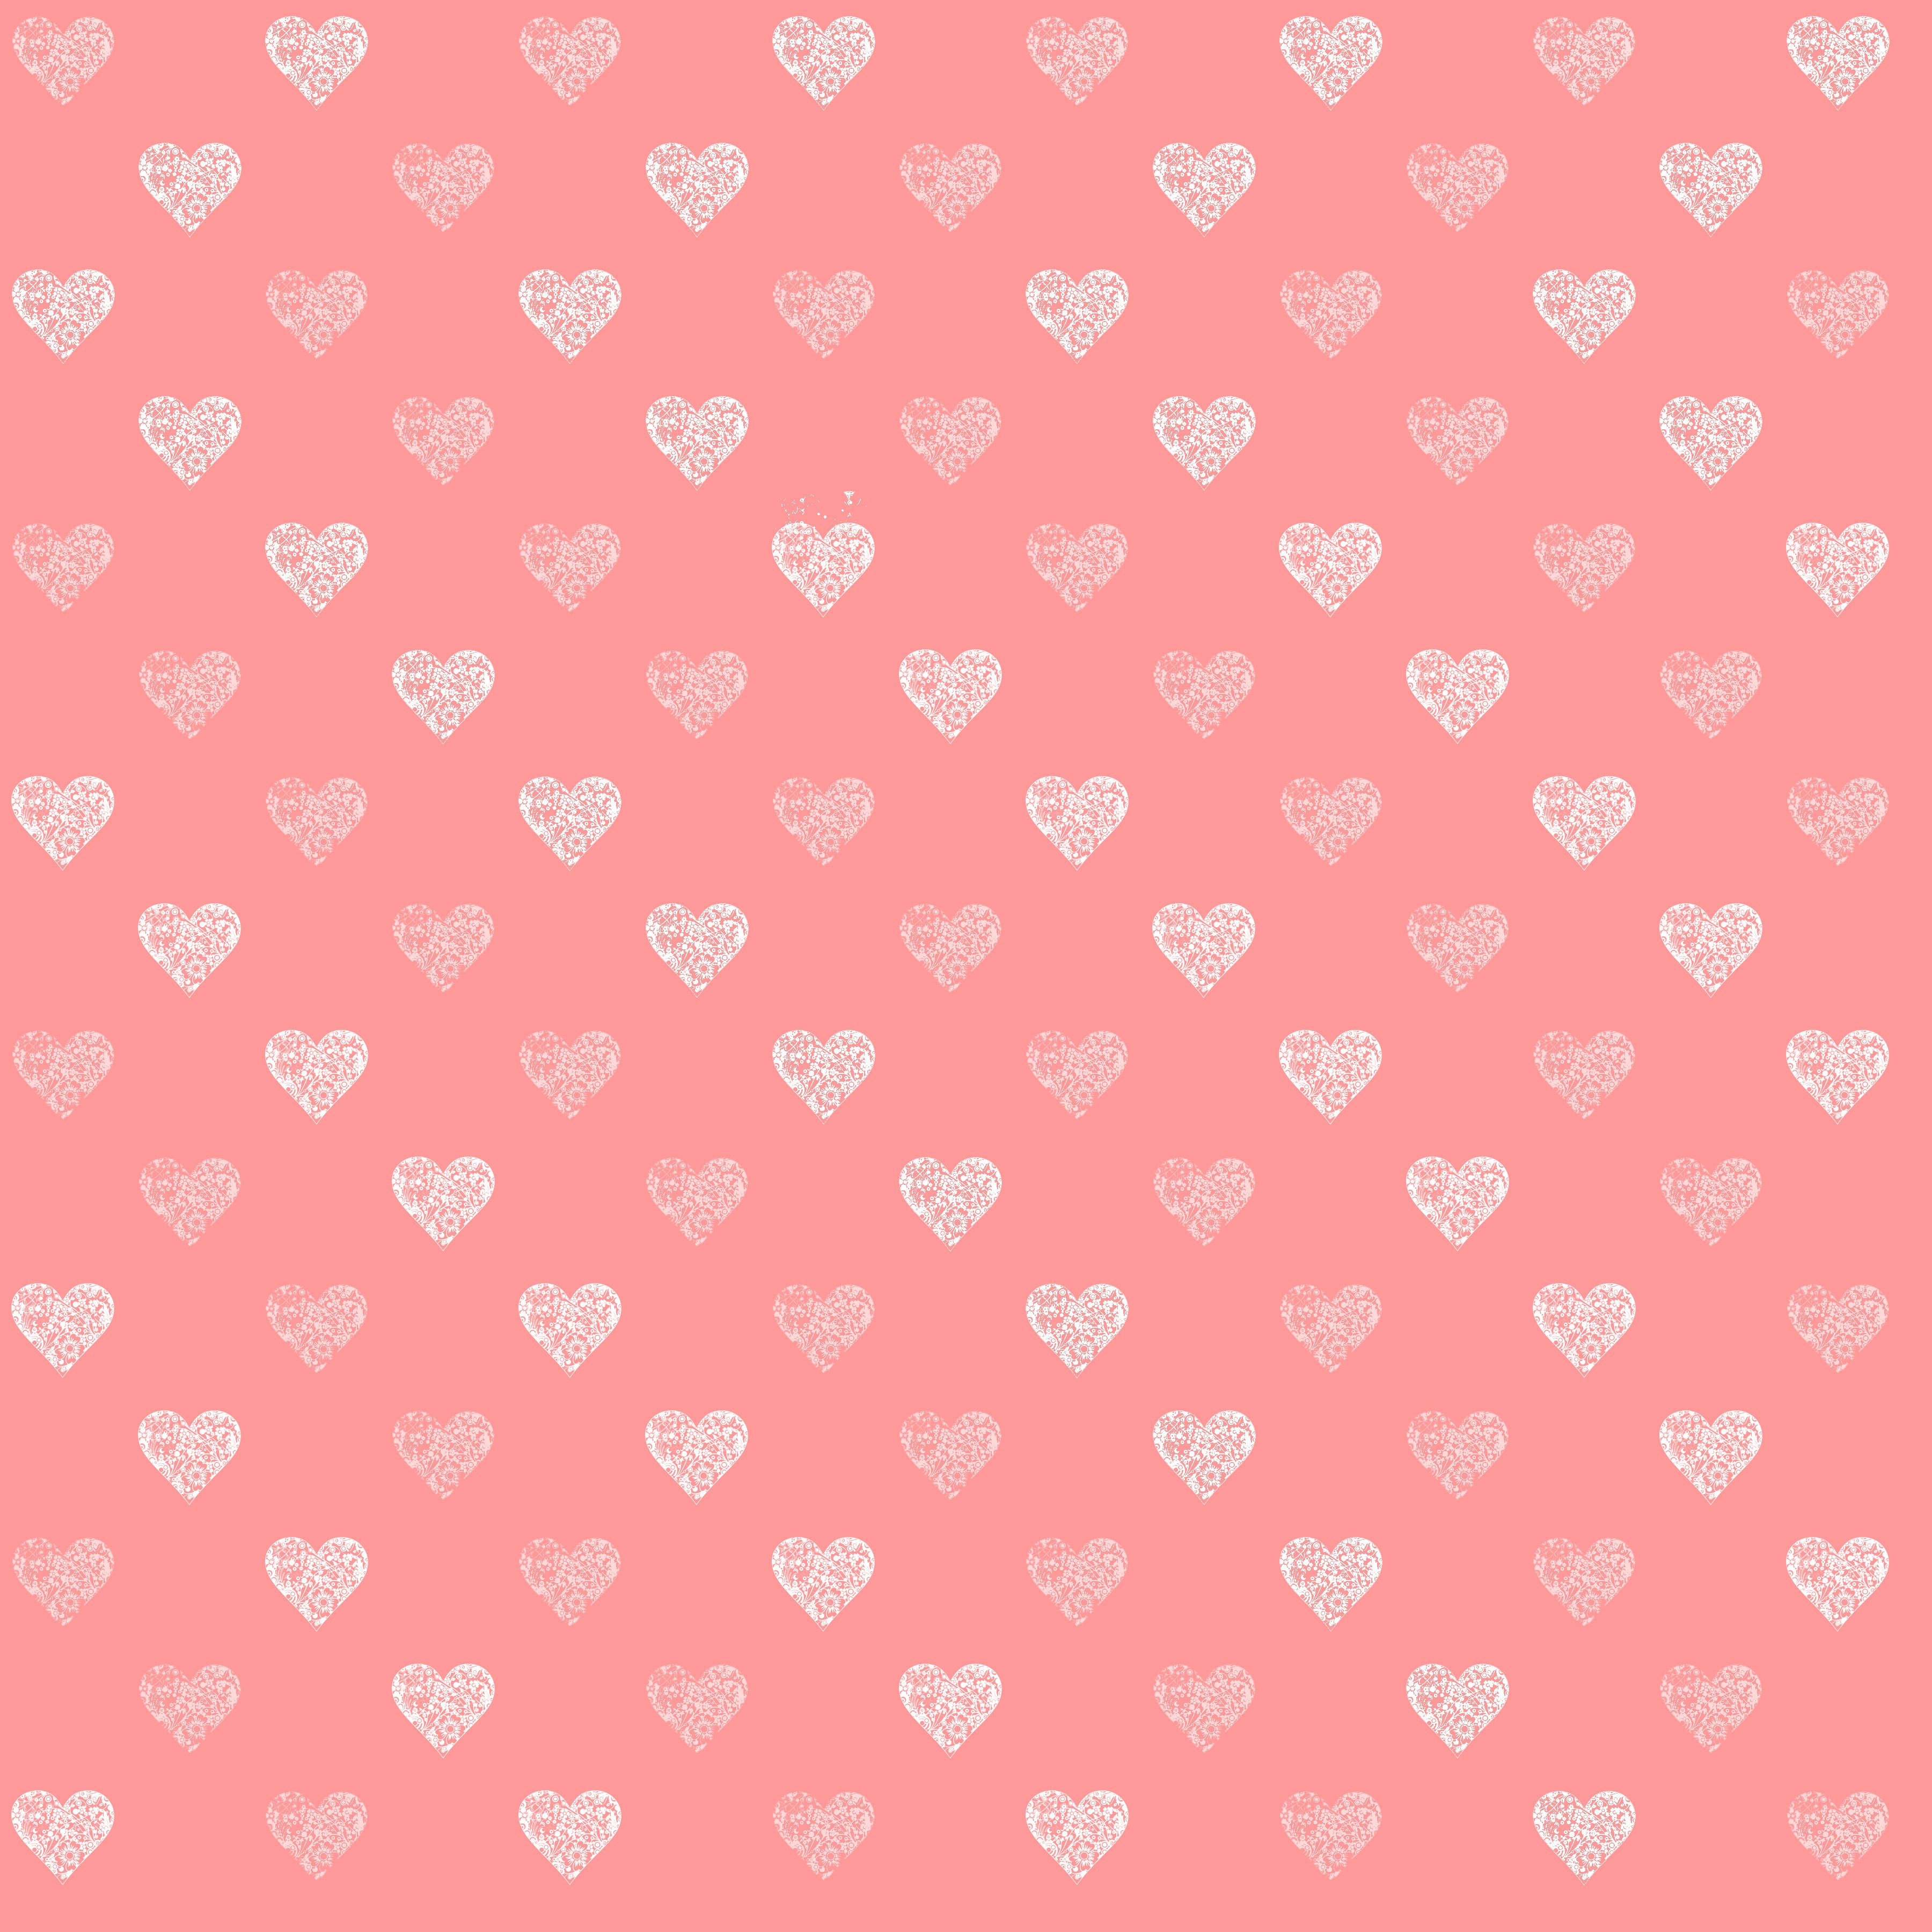 pink hearts background wwwpixsharkcom images